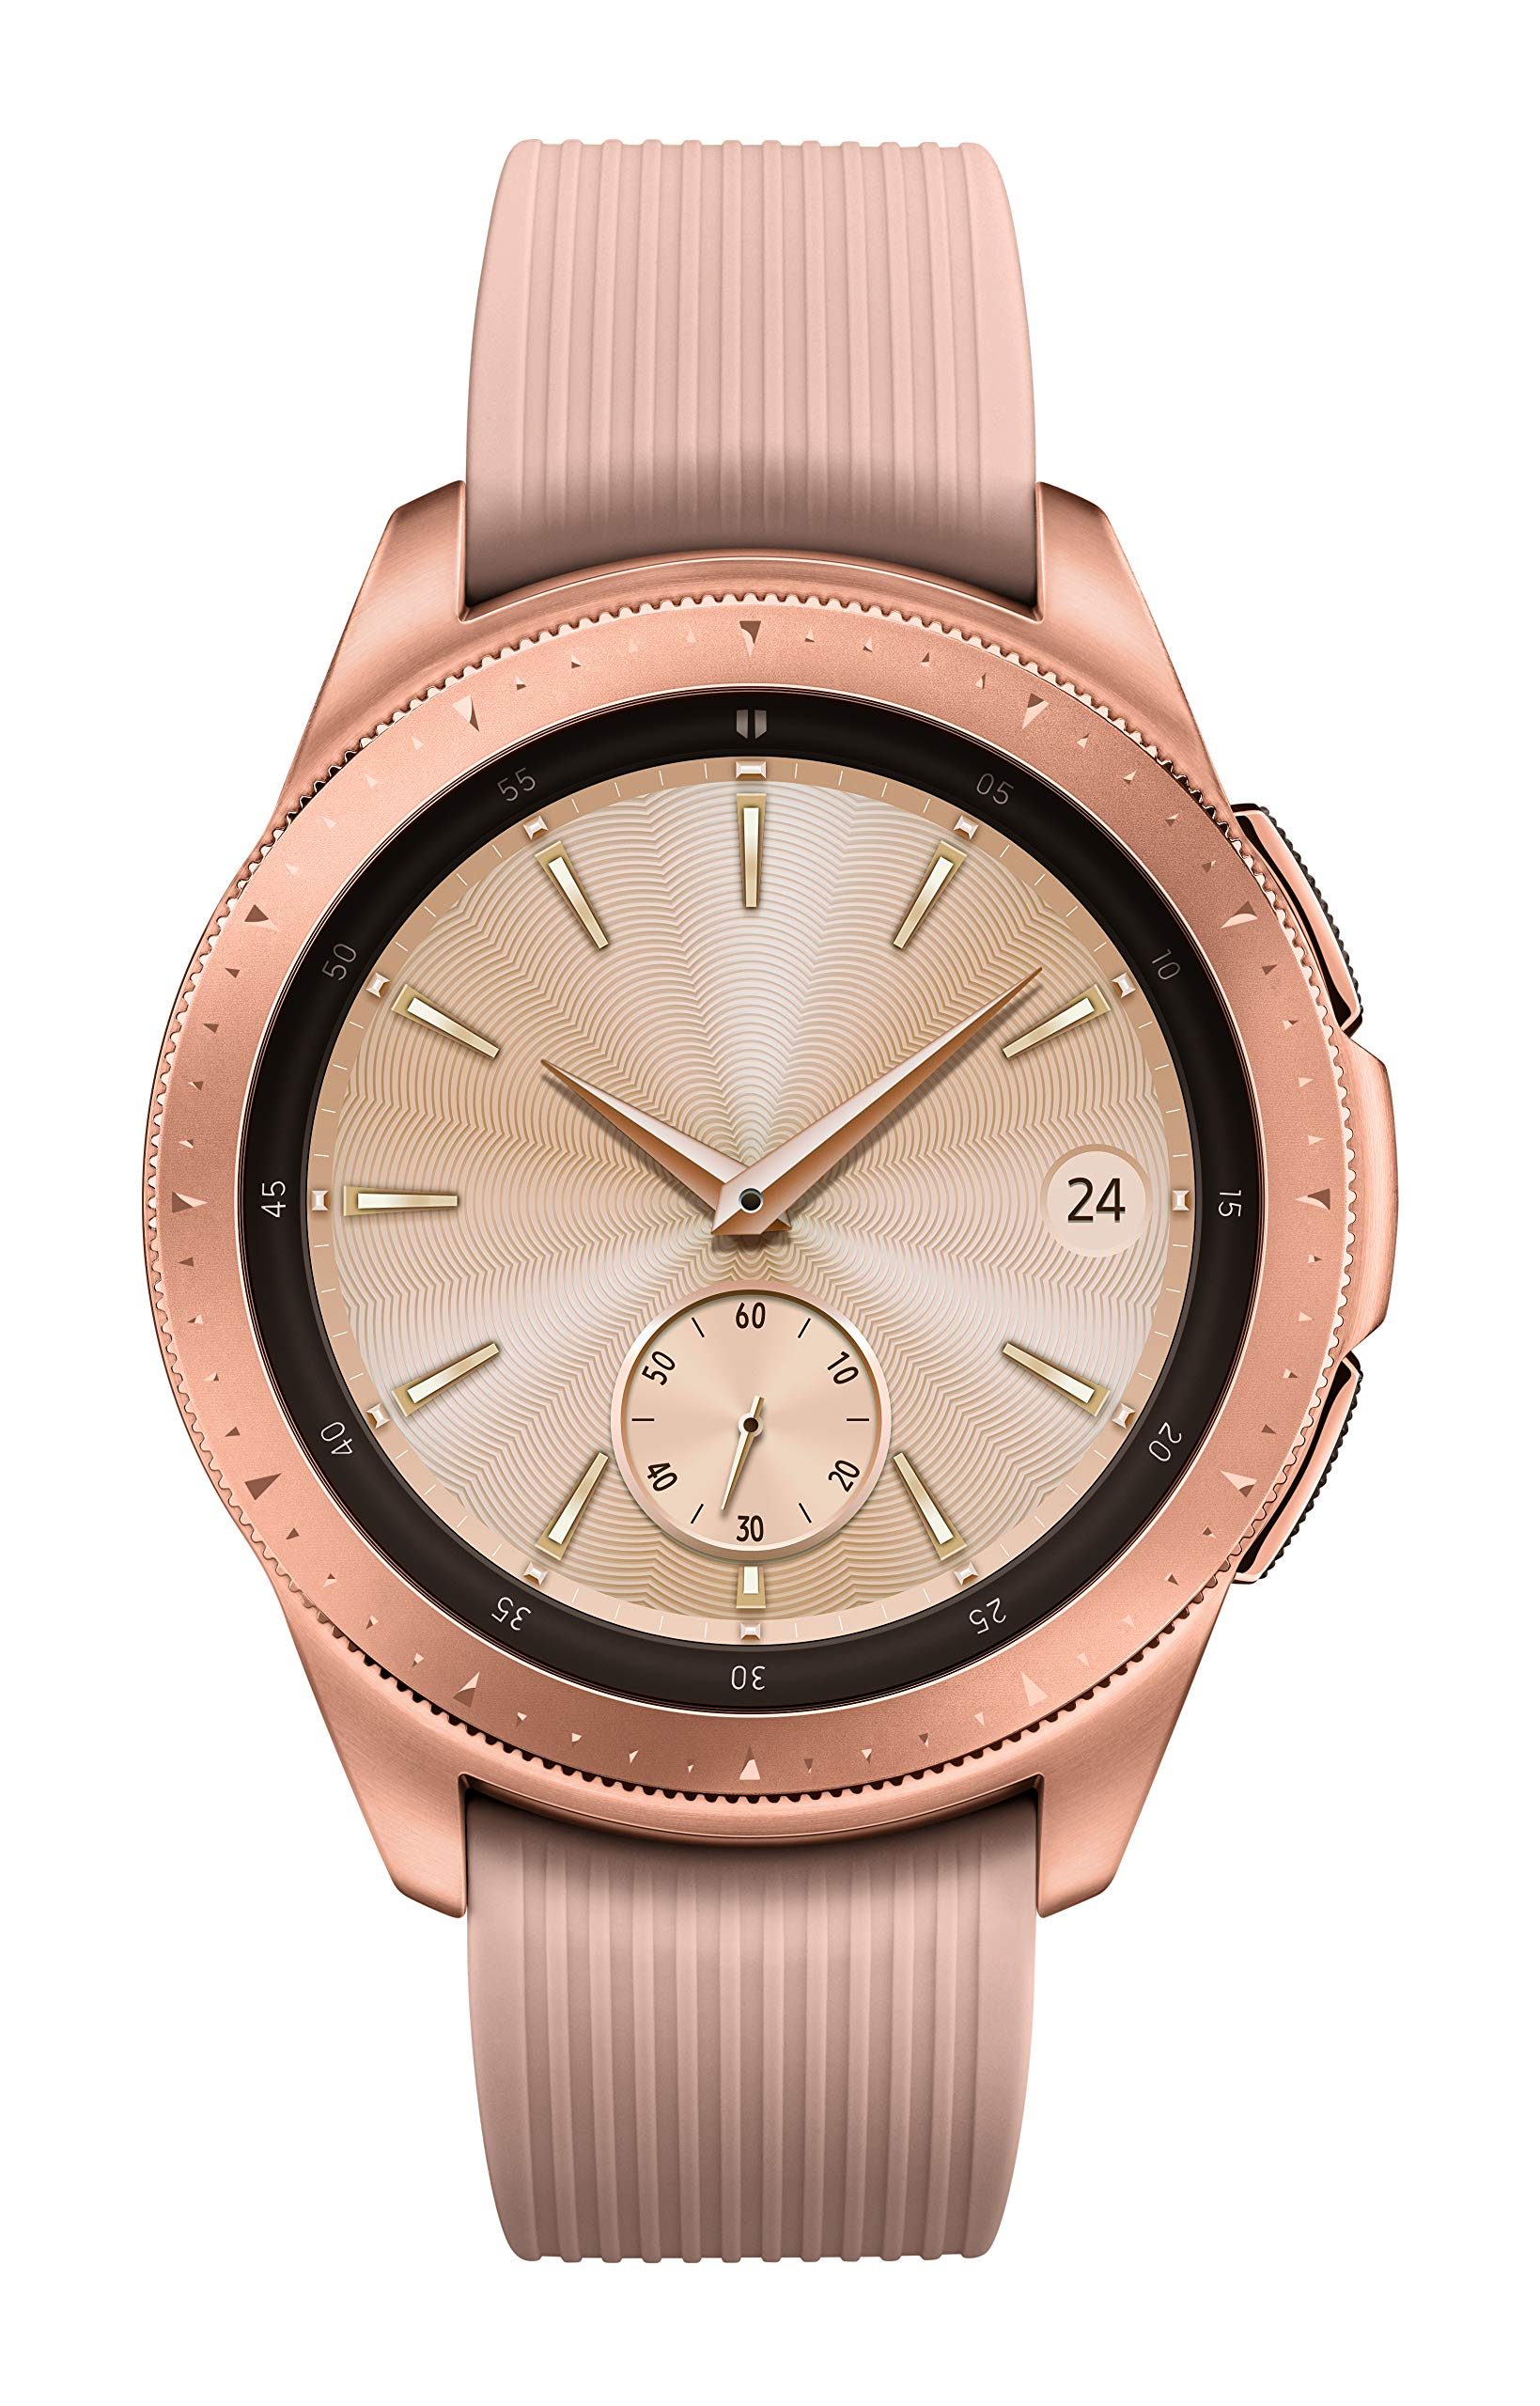 Samsung Galaxy Watch Refurbished Smart Watch